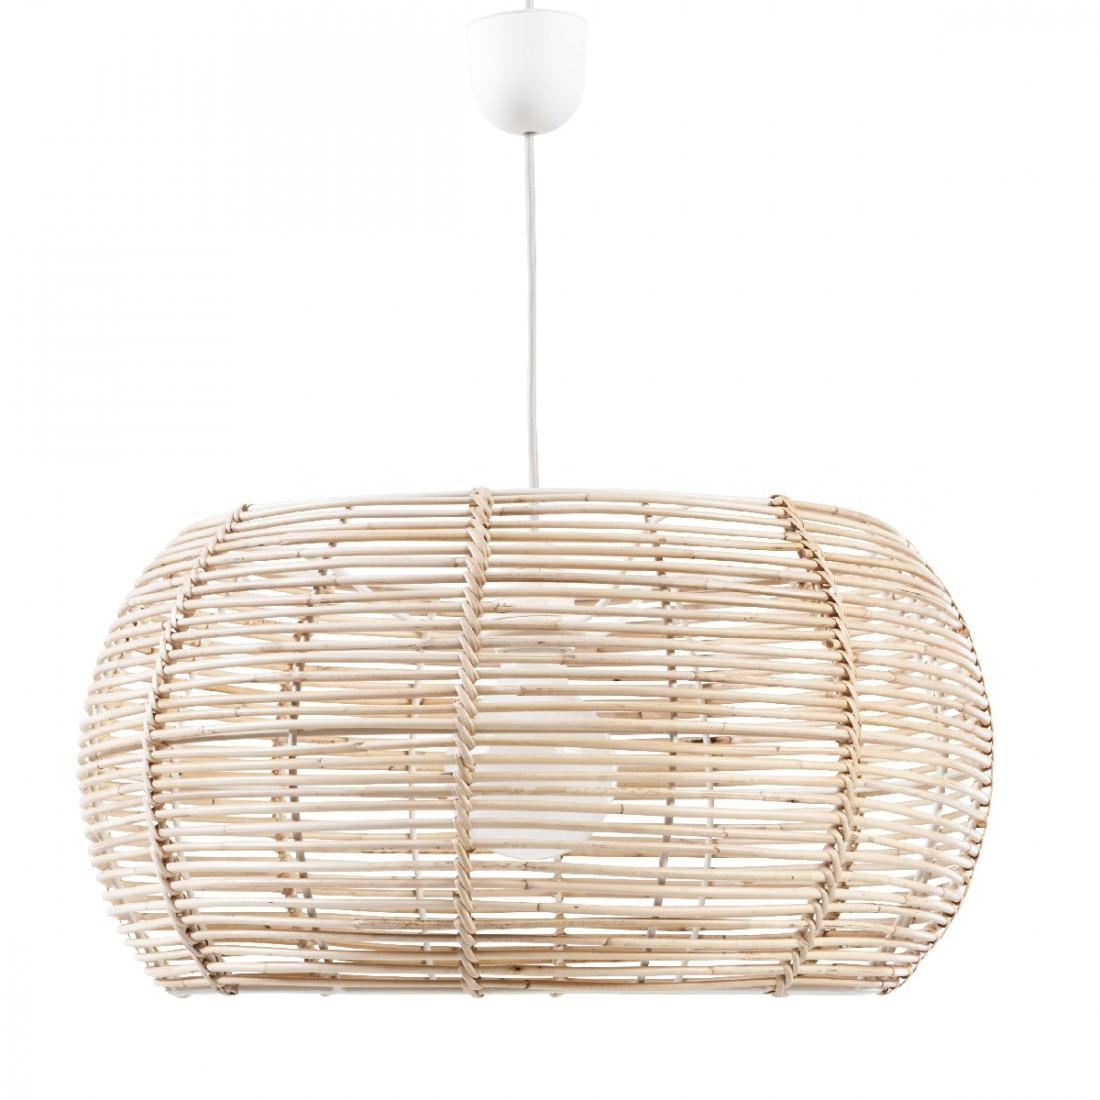 abat jour en rotin naturel suspension rotin kok uk. Black Bedroom Furniture Sets. Home Design Ideas